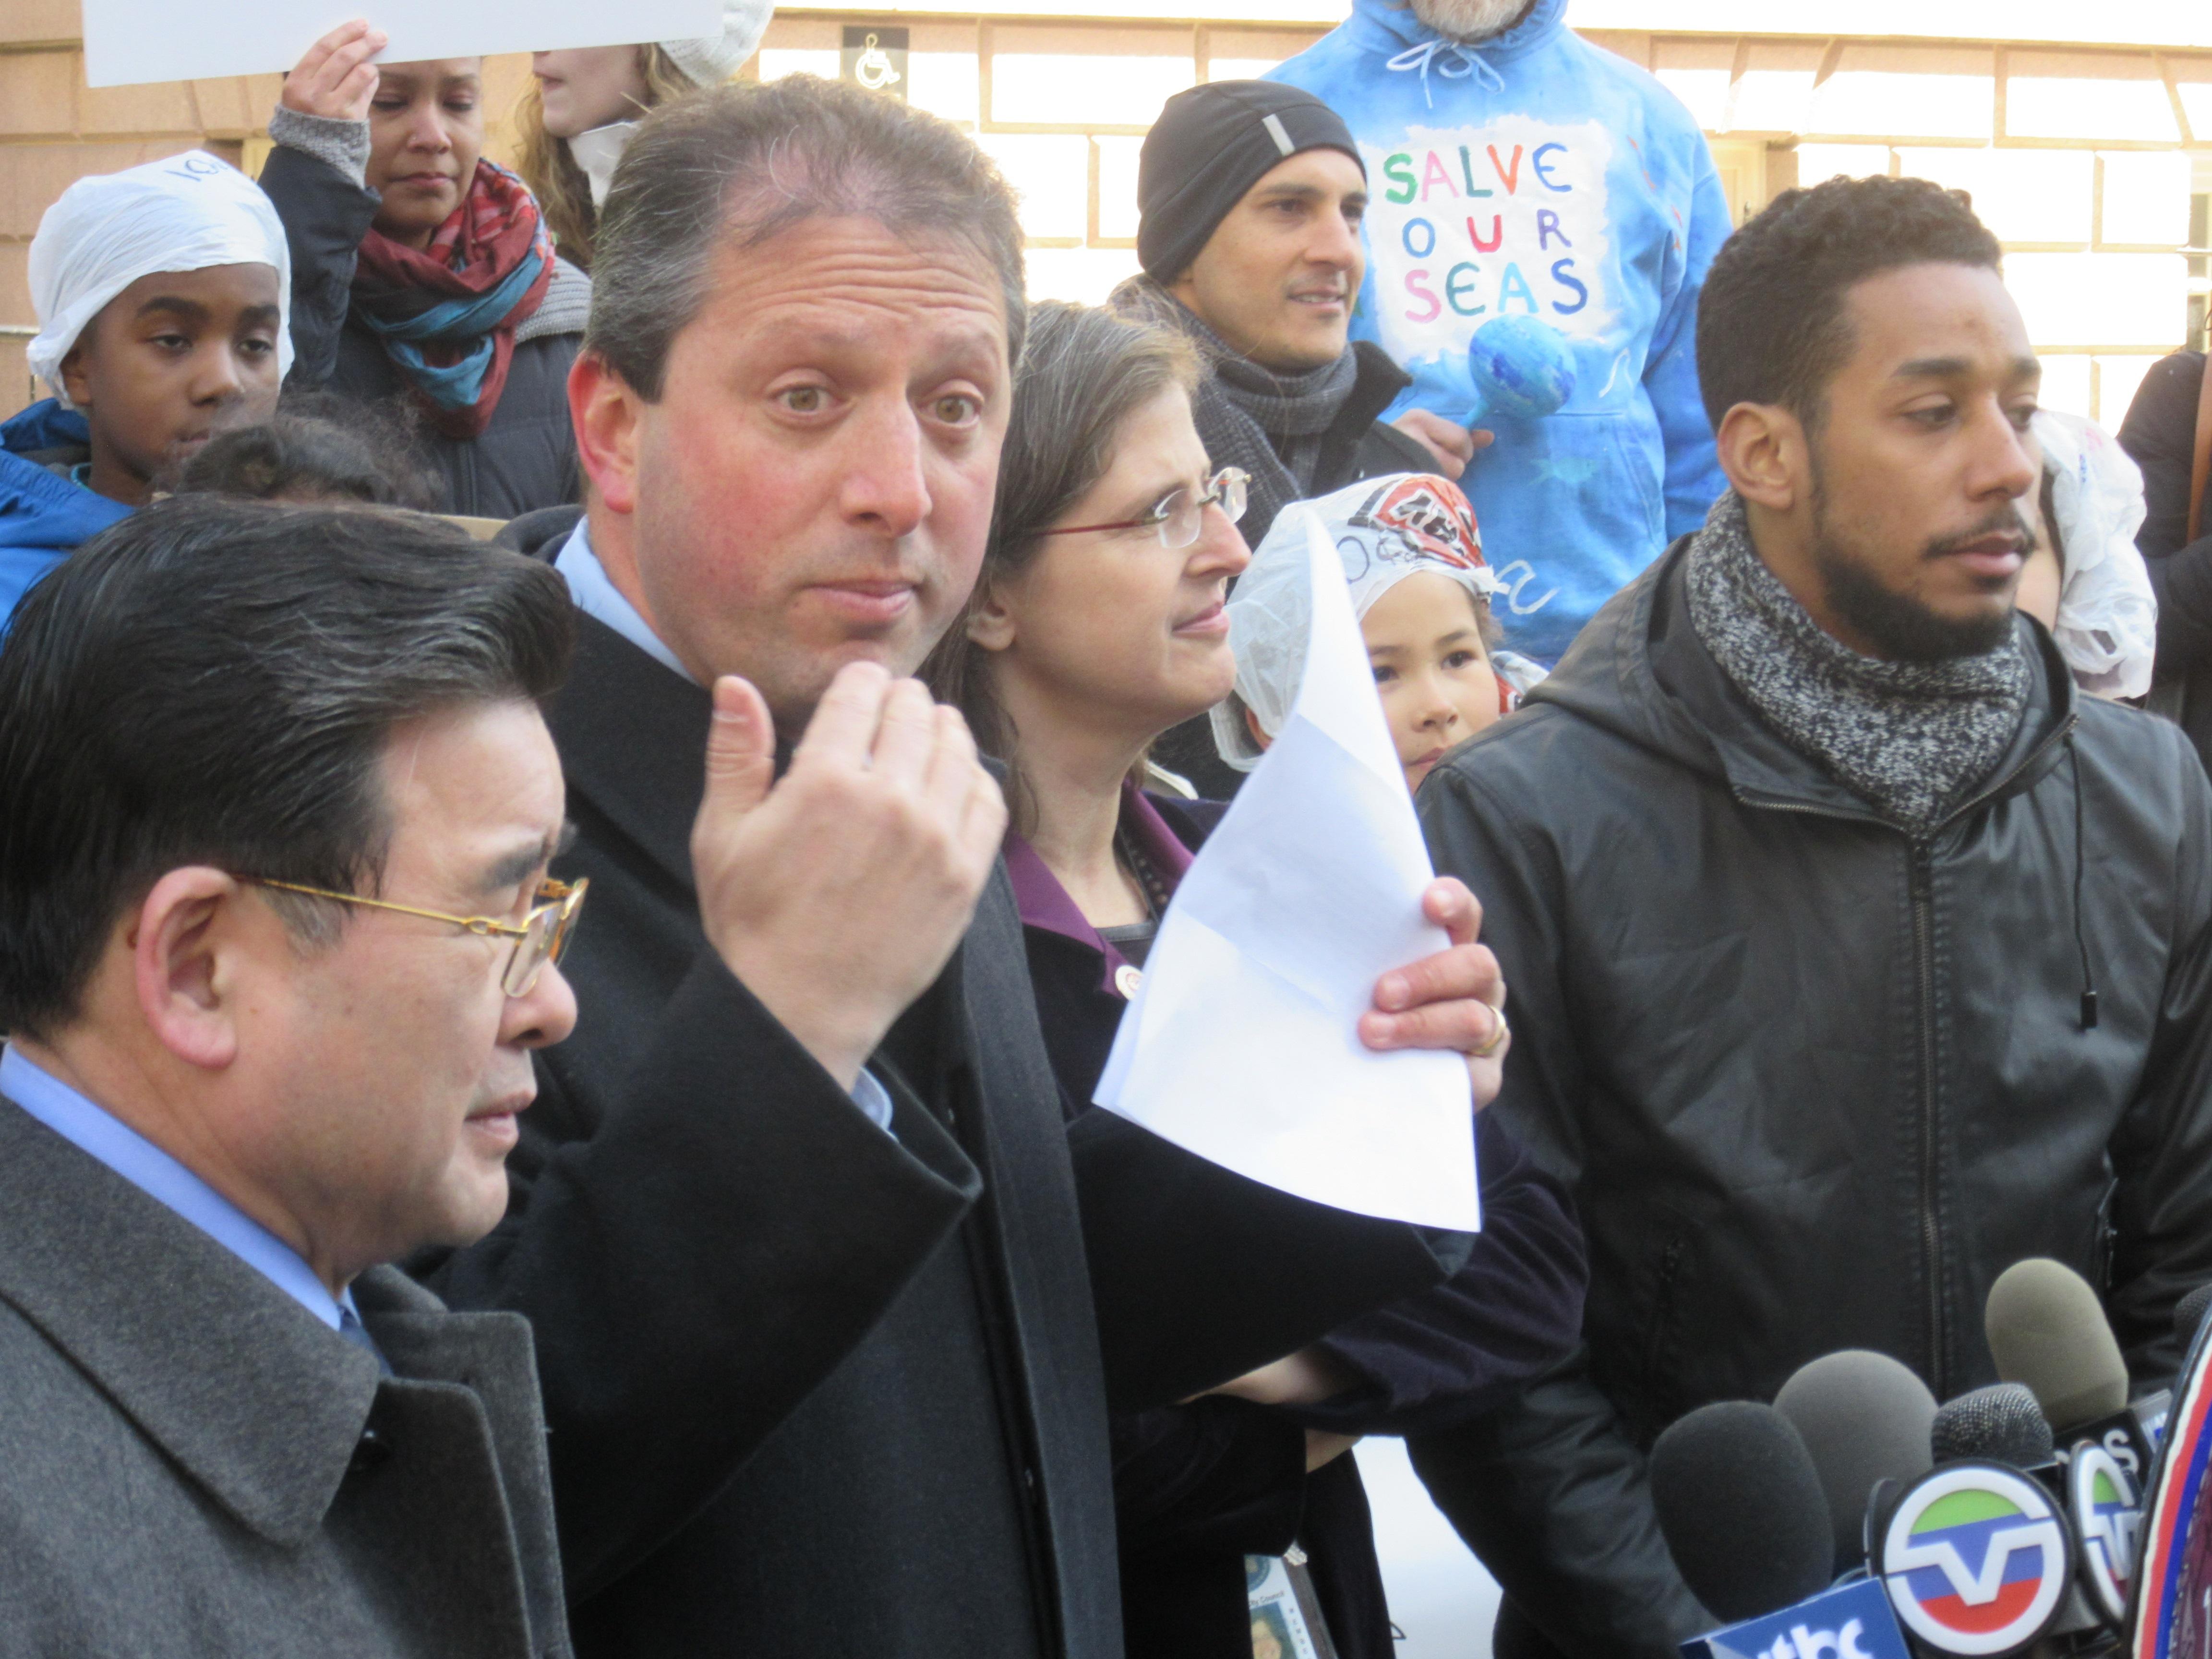 Councilman Brad Lander, center, speaks alongside Councilman Peter Koo, left, Councilwoman Helen Rosenthal and Councilman Antonio Reynoso (Photo: Will Bredderman/New York Observer).